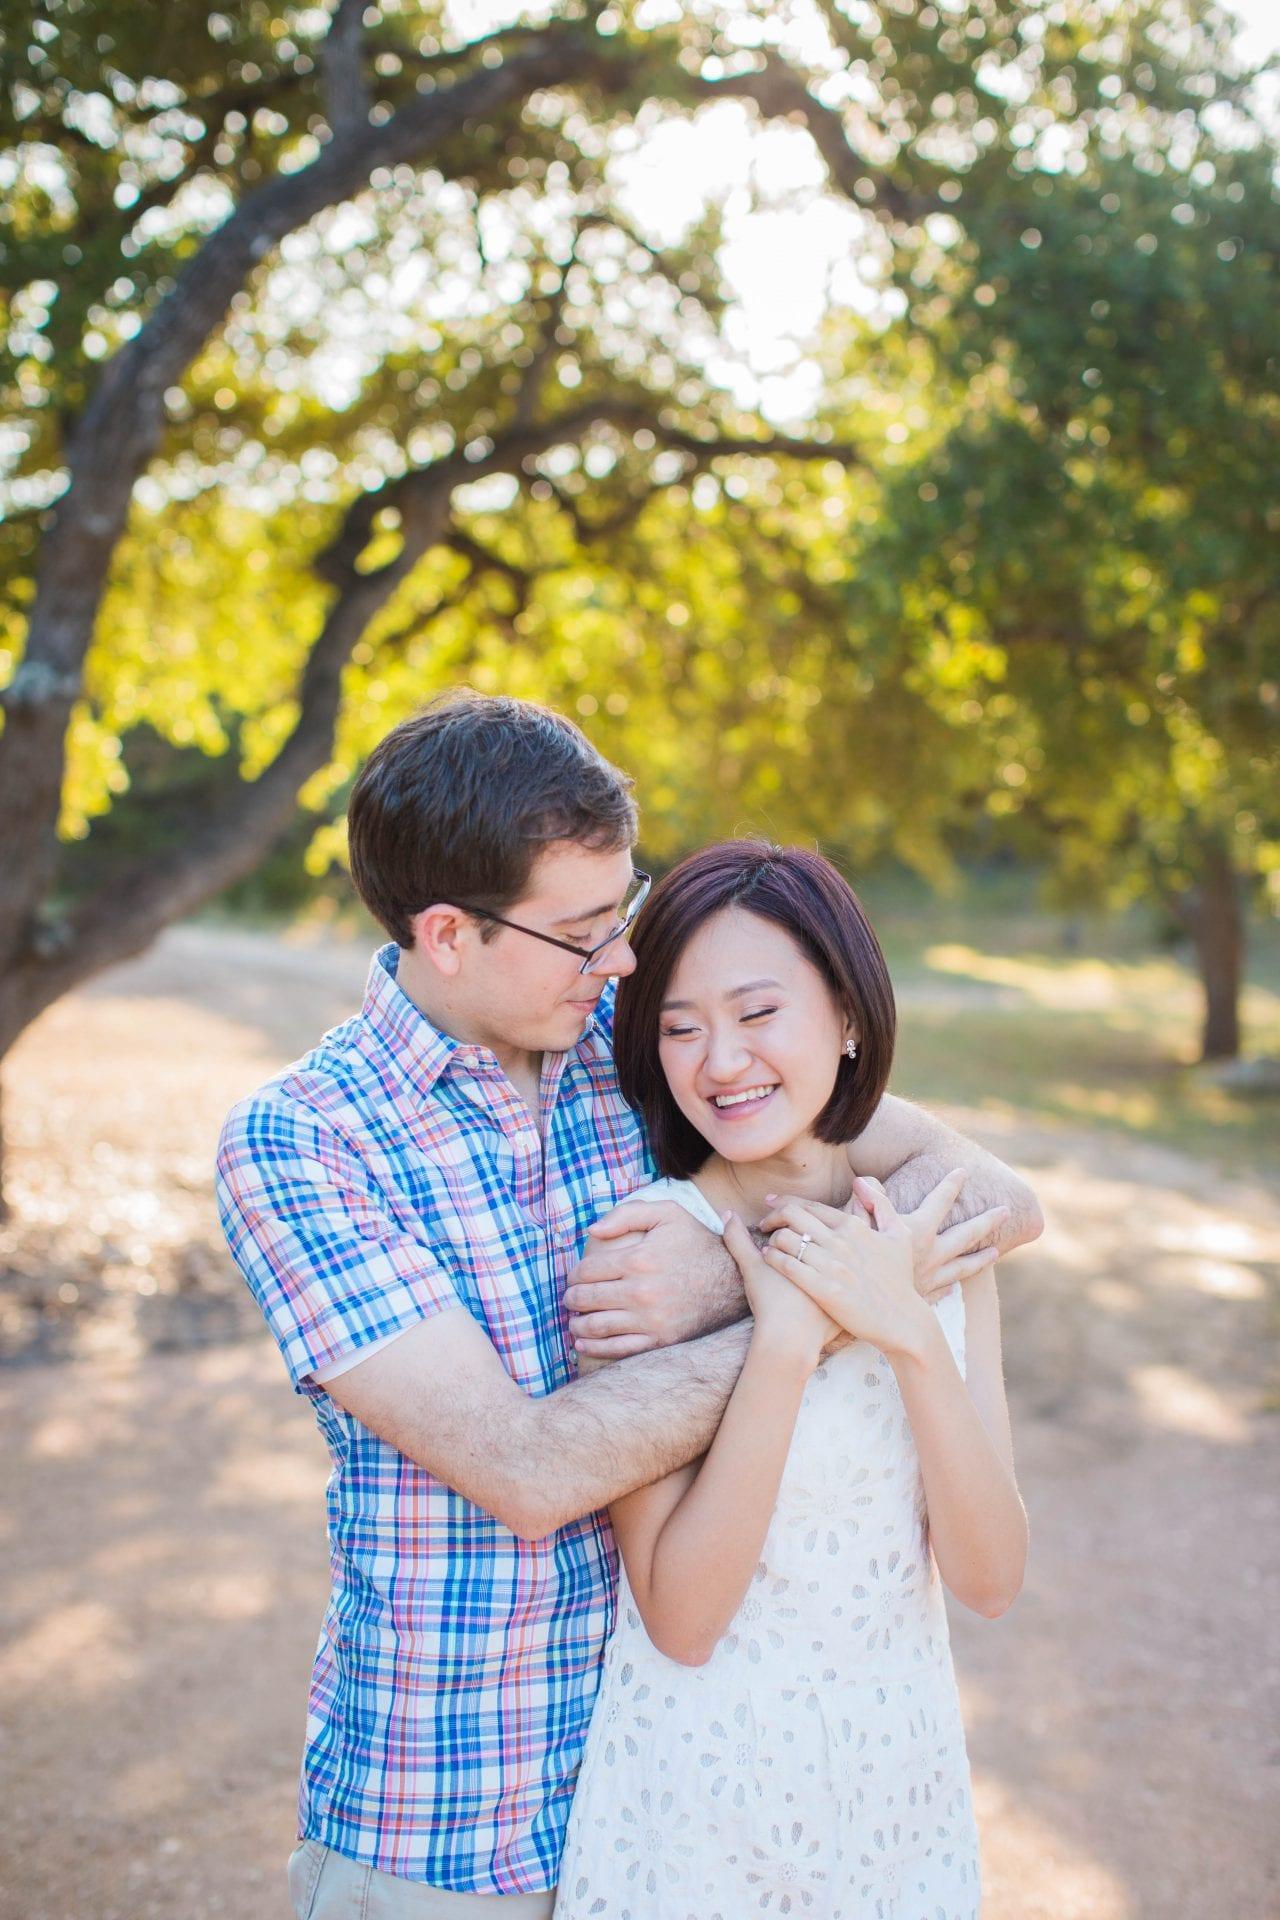 Josh and Tina engagement session at Kendall plantation hug on path